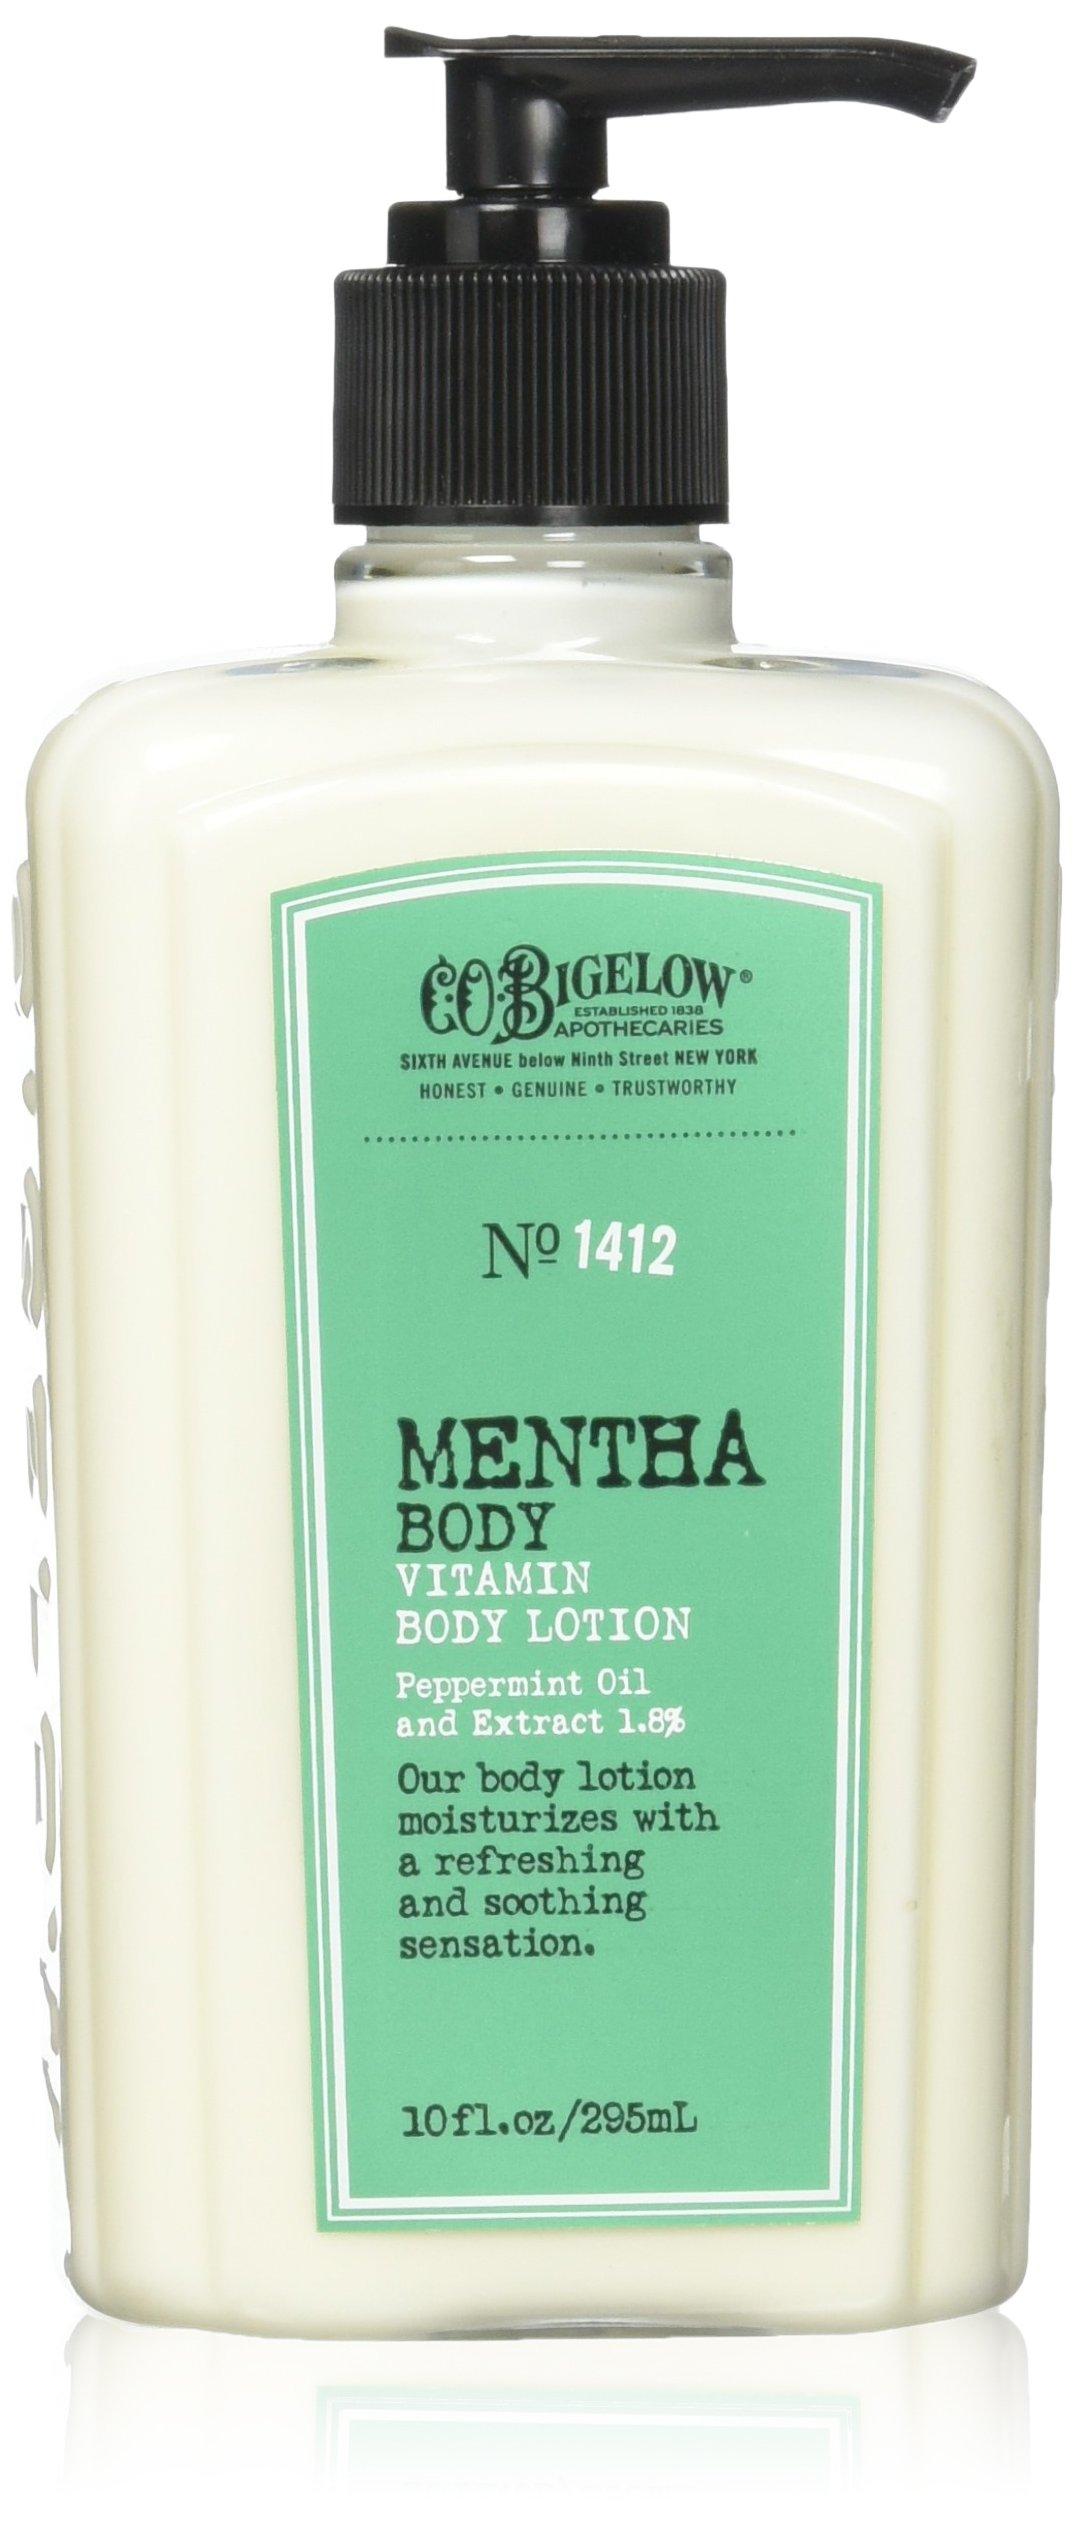 C.O. Bigelow Mentha Vitamin Body Lotion 10 Oz. by C. O. Bigelow